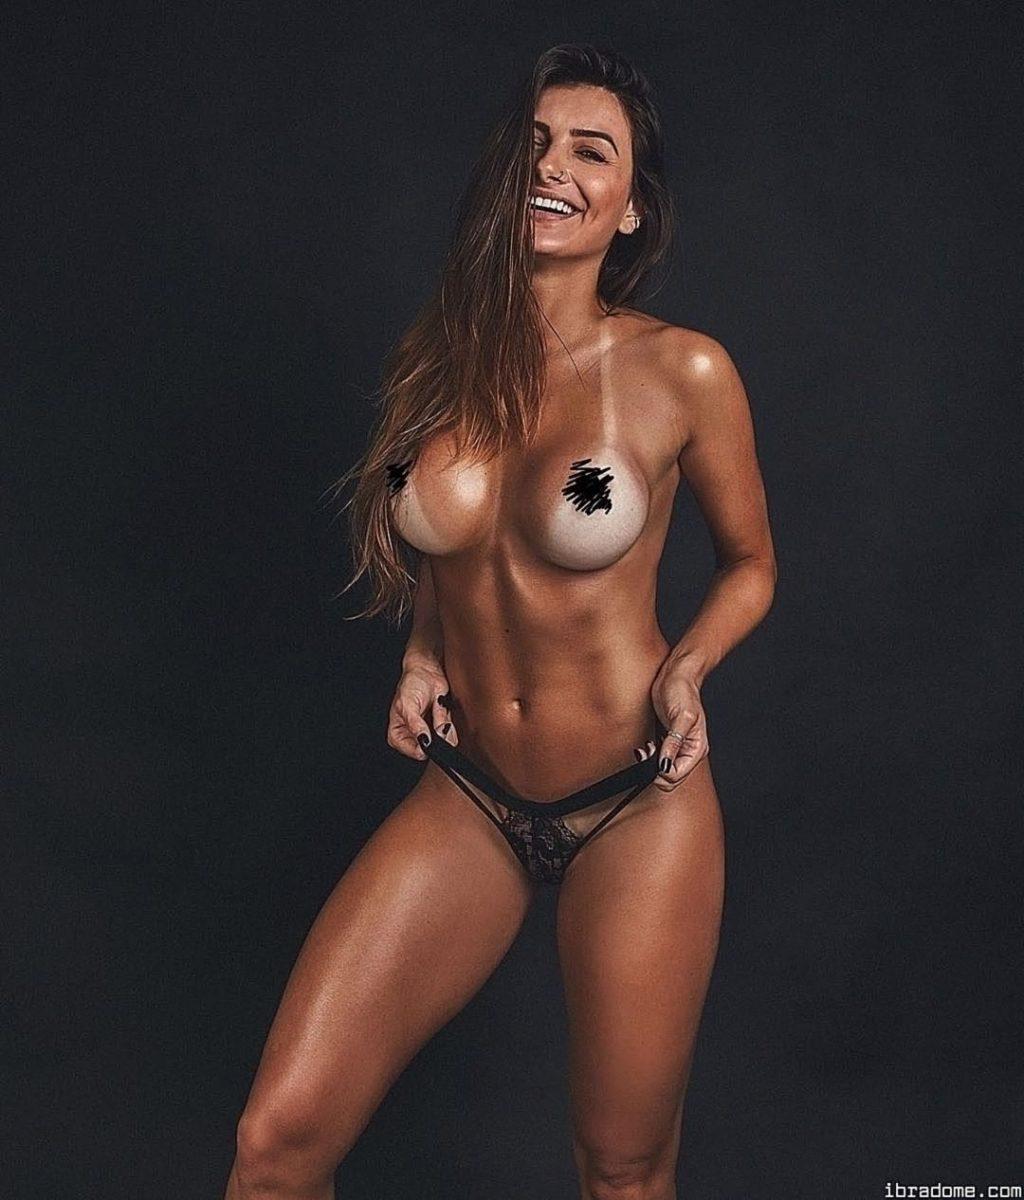 Sarah Caus Nude LEAKED & Sexy (134 Photos + Sex Tape Porn Video)